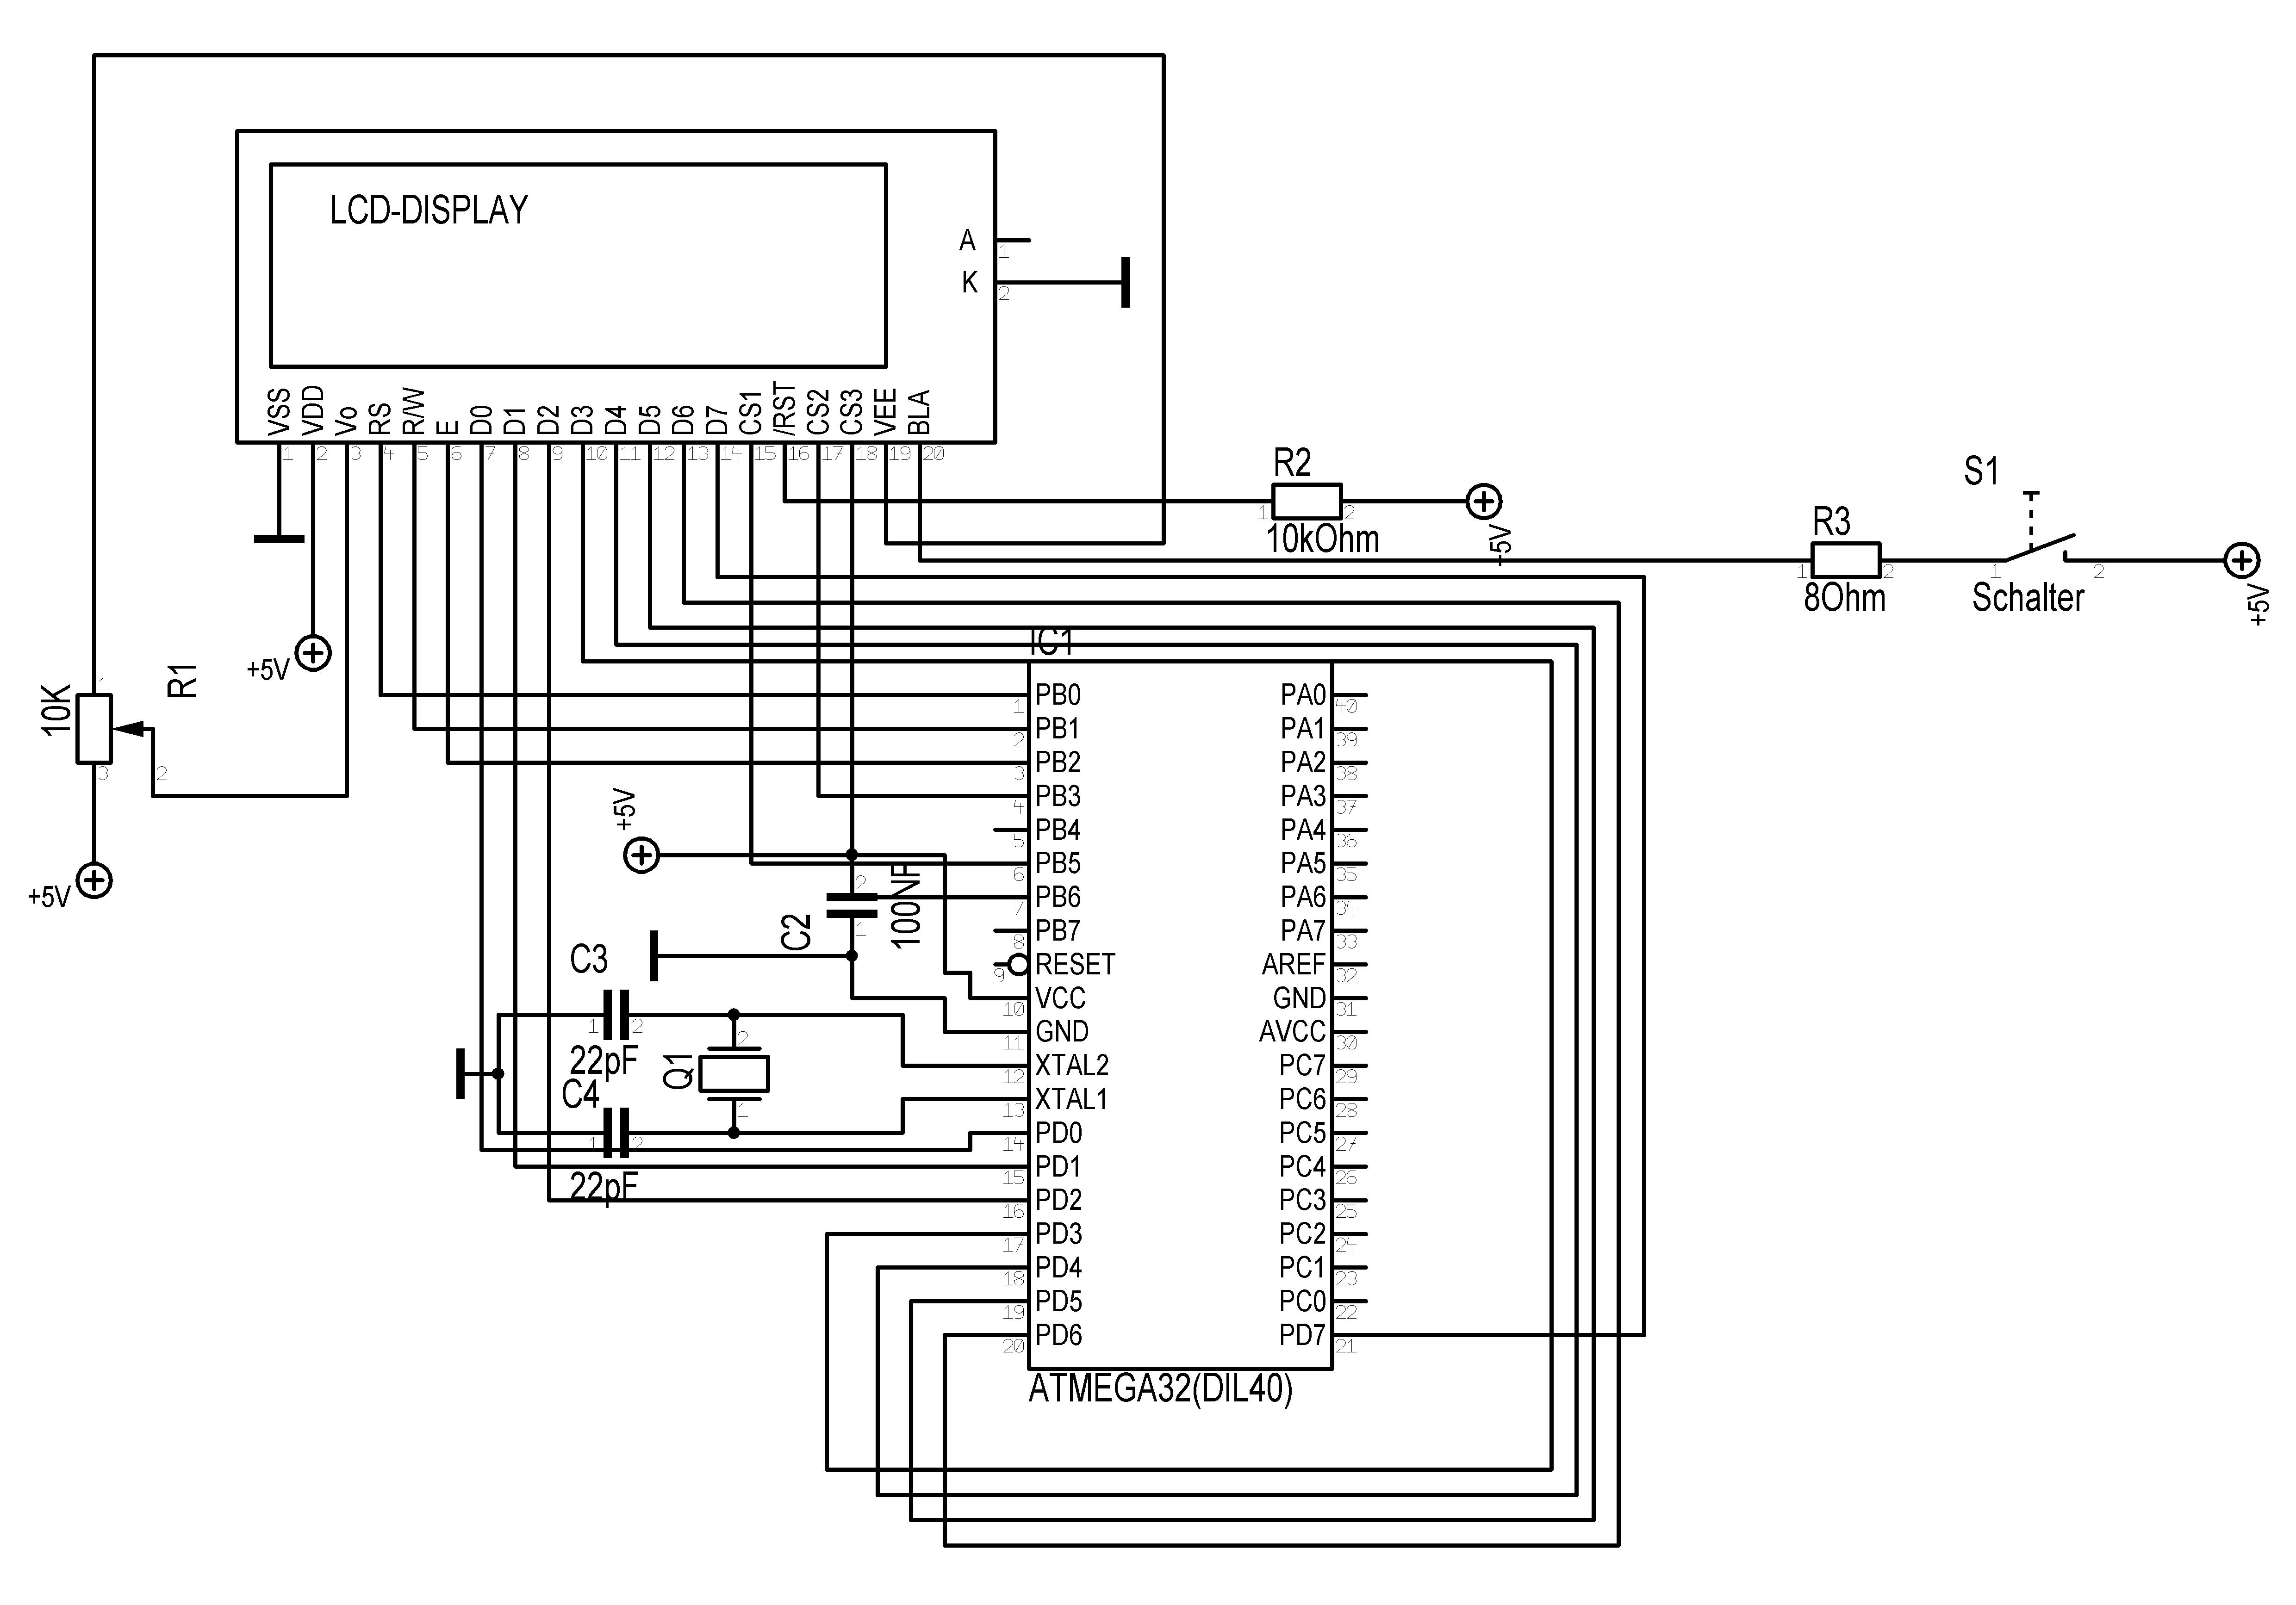 lcd dm19264a  ks0108b controller